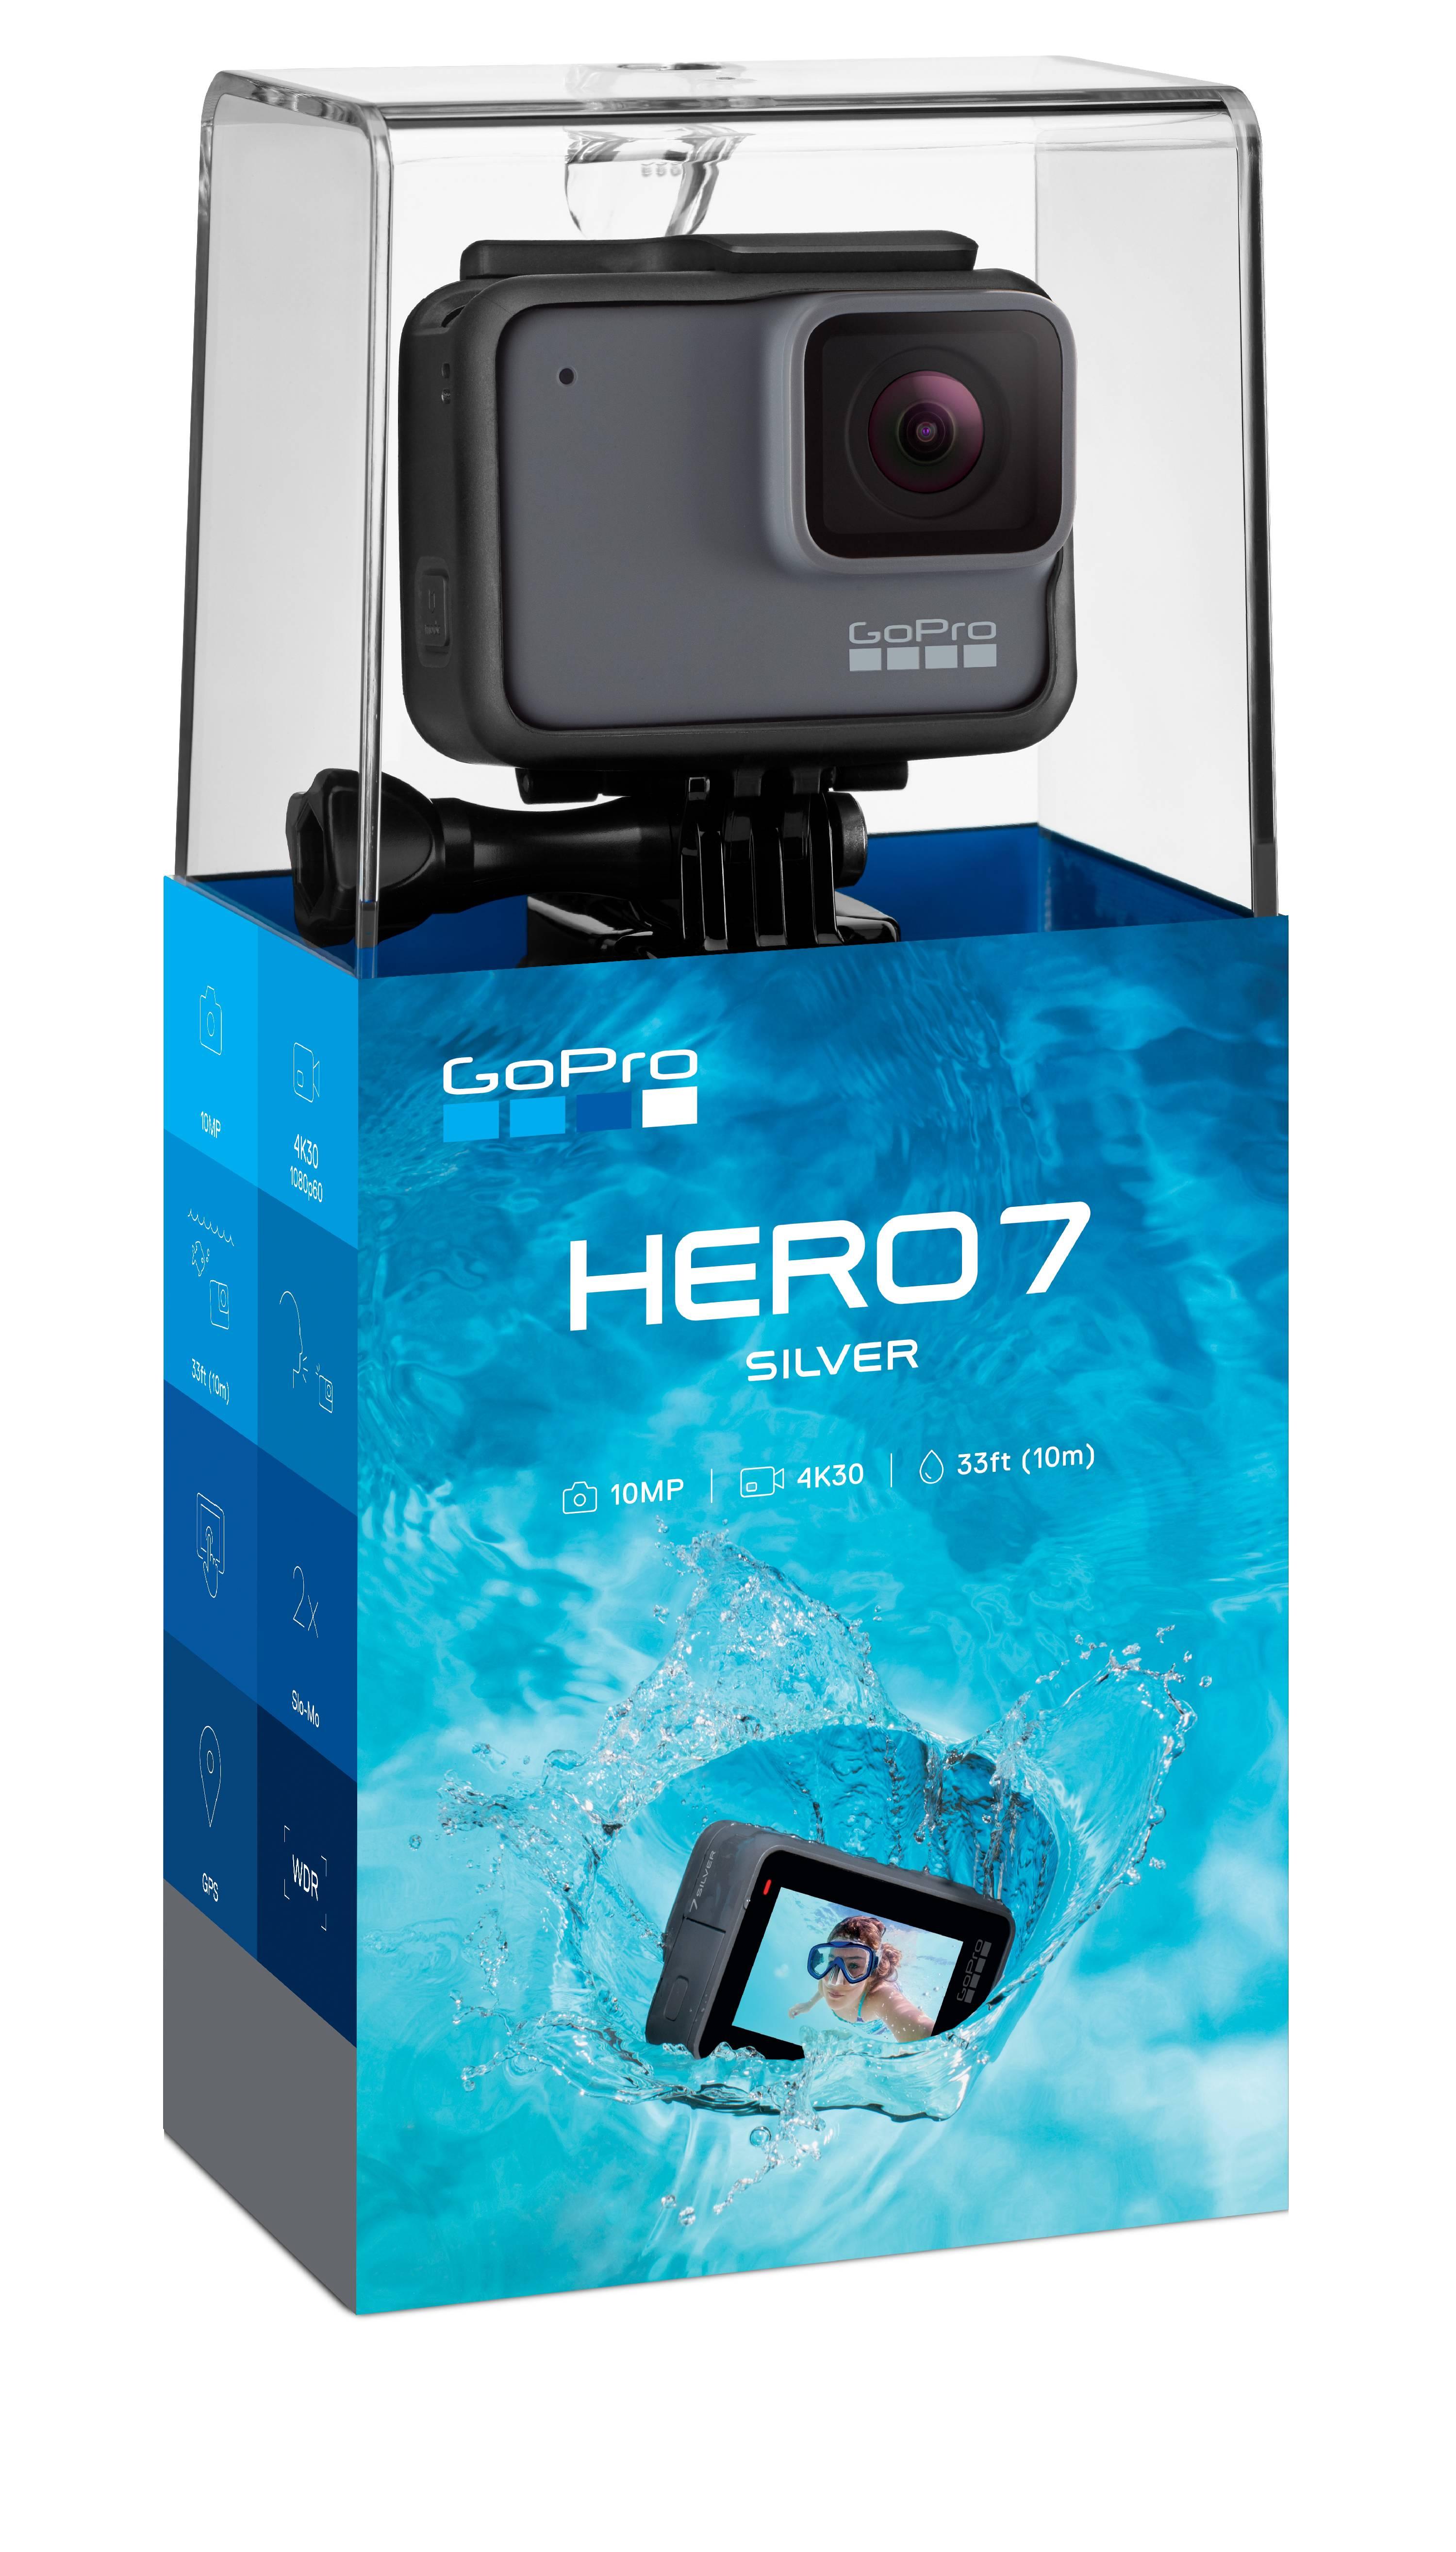 GoPro HERO7 Silver Walmart, $99.00, YMMV